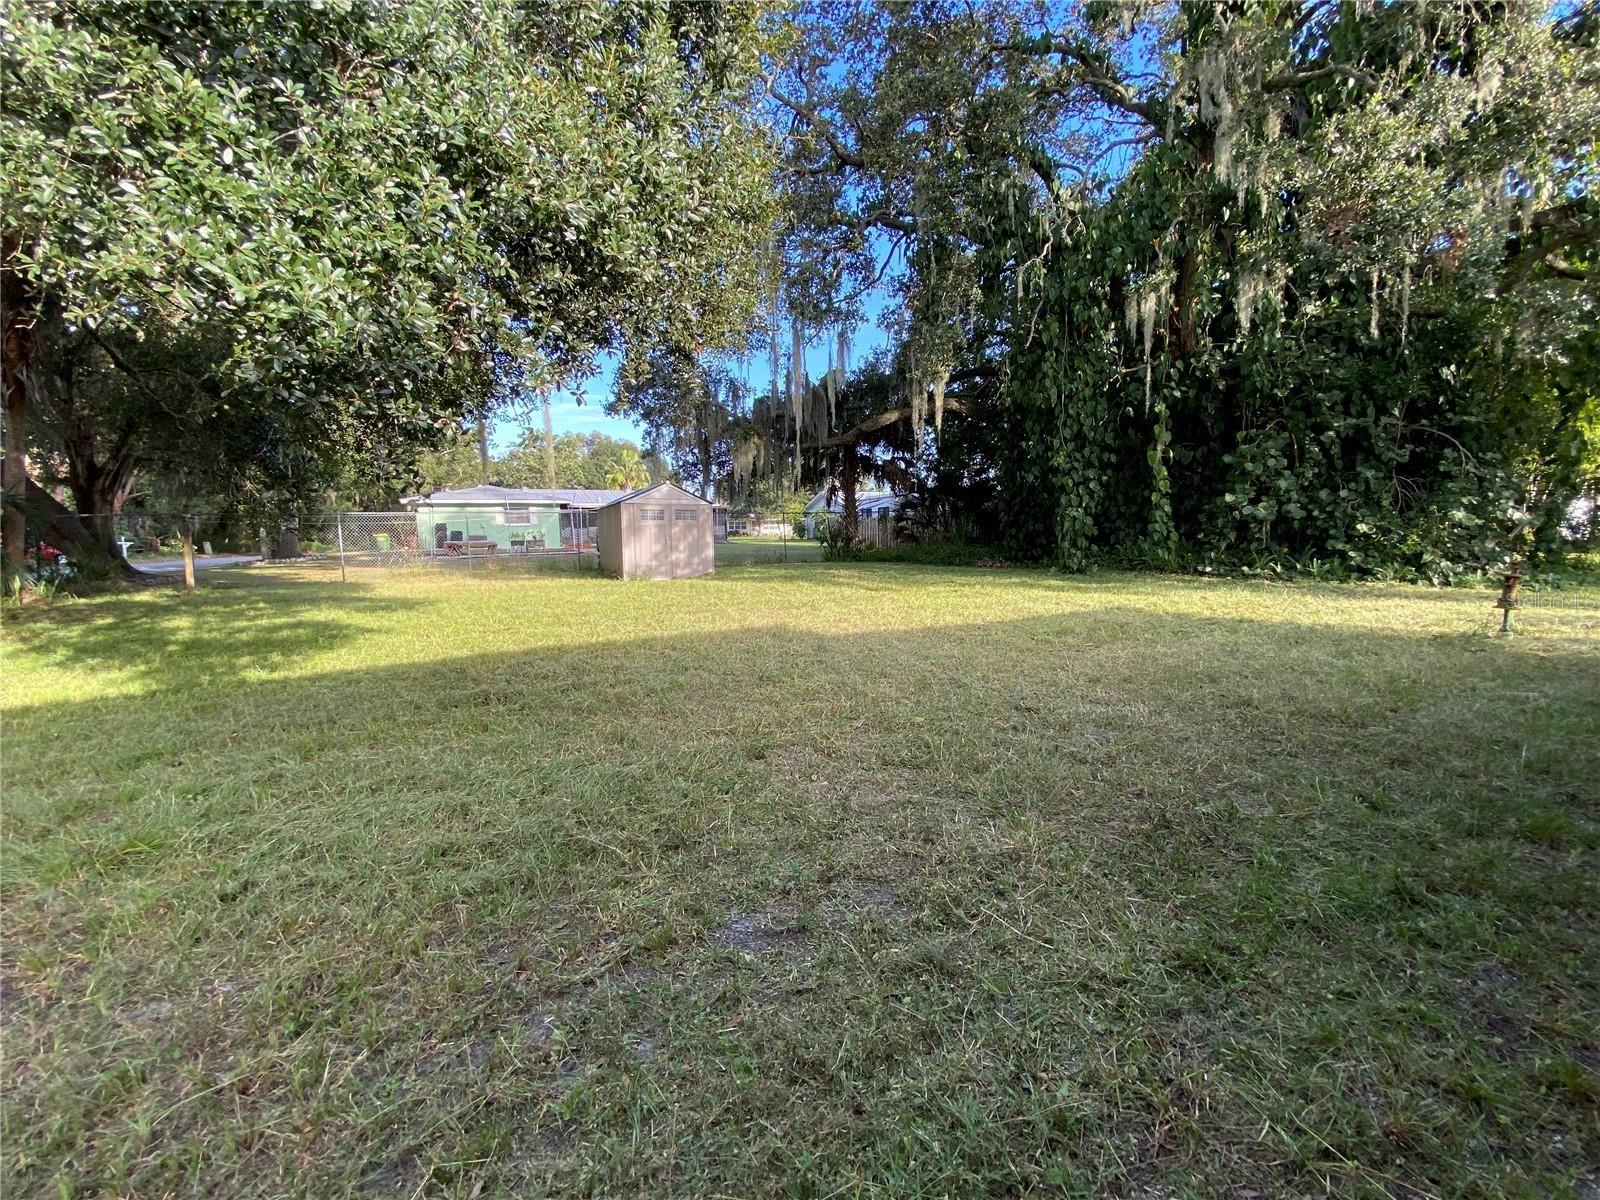 Photo of 240 N BRIGGS AVE, SARASOTA, FL 34237 (MLS # A4515547)